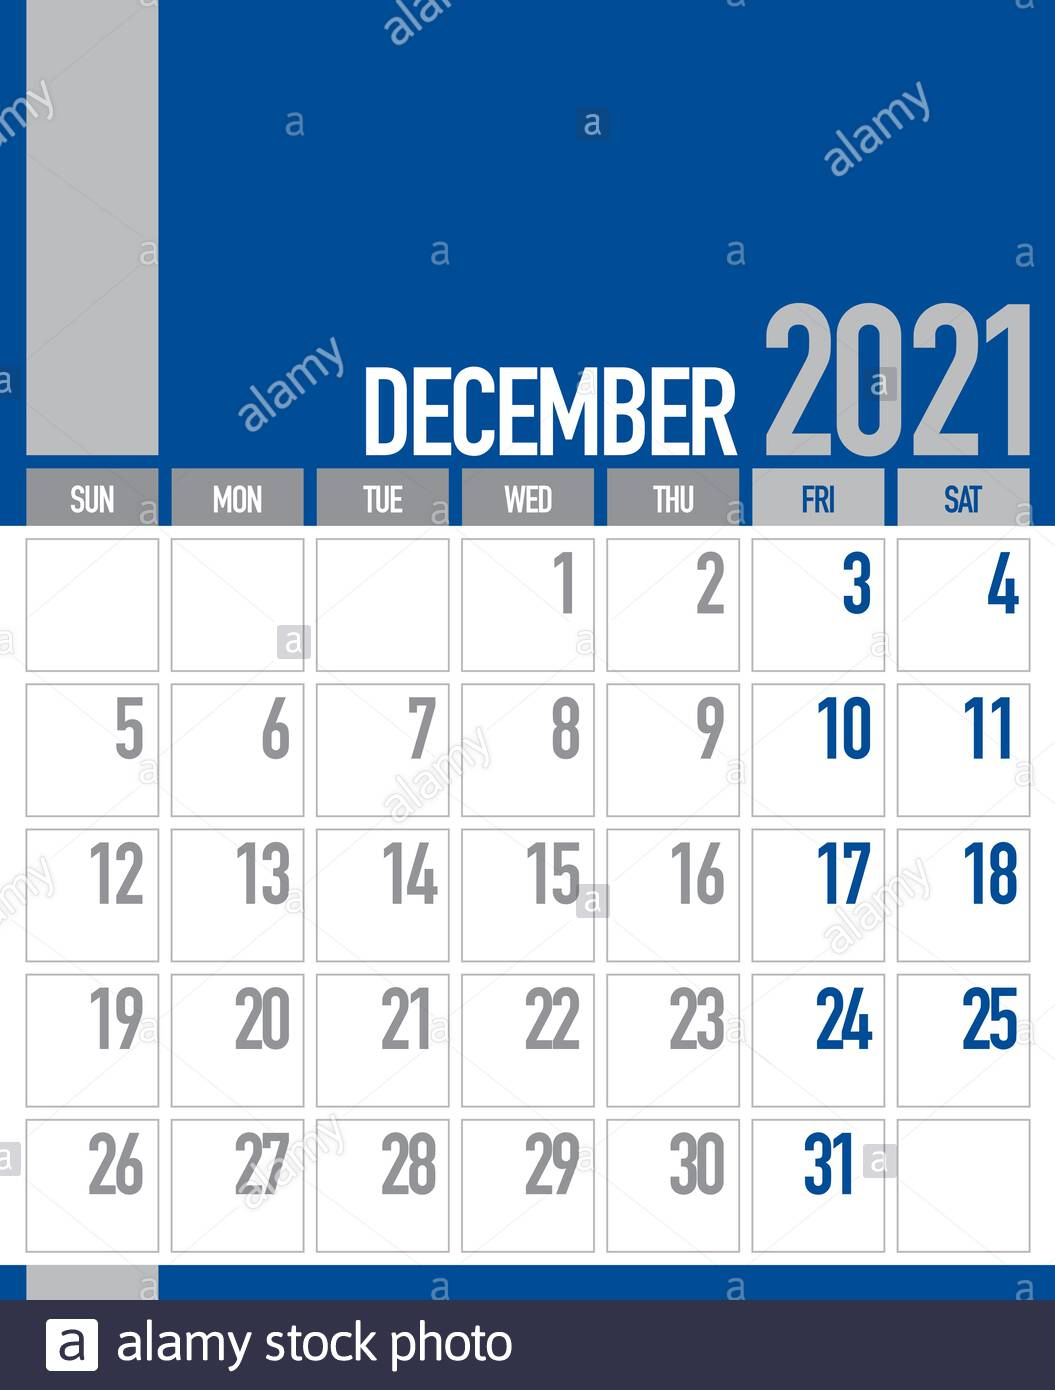 December 2021 Business Planner Calendar Stock Photo - Alamy